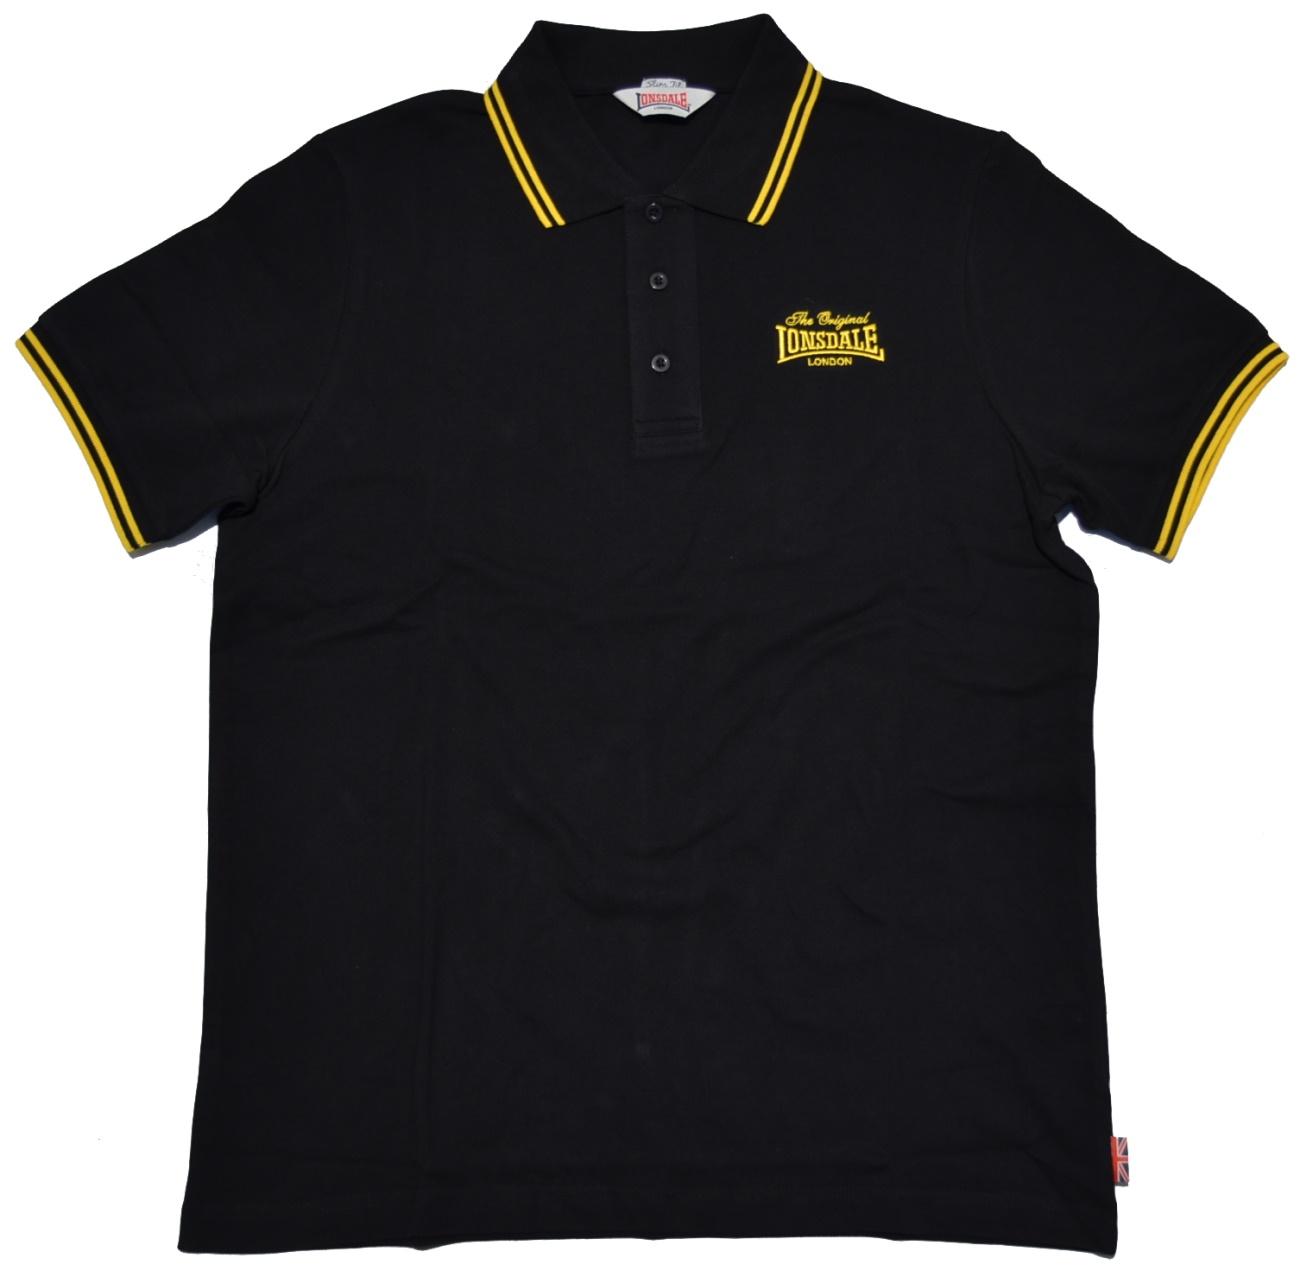 Lonsdale London Polo-Shirt Bridlington